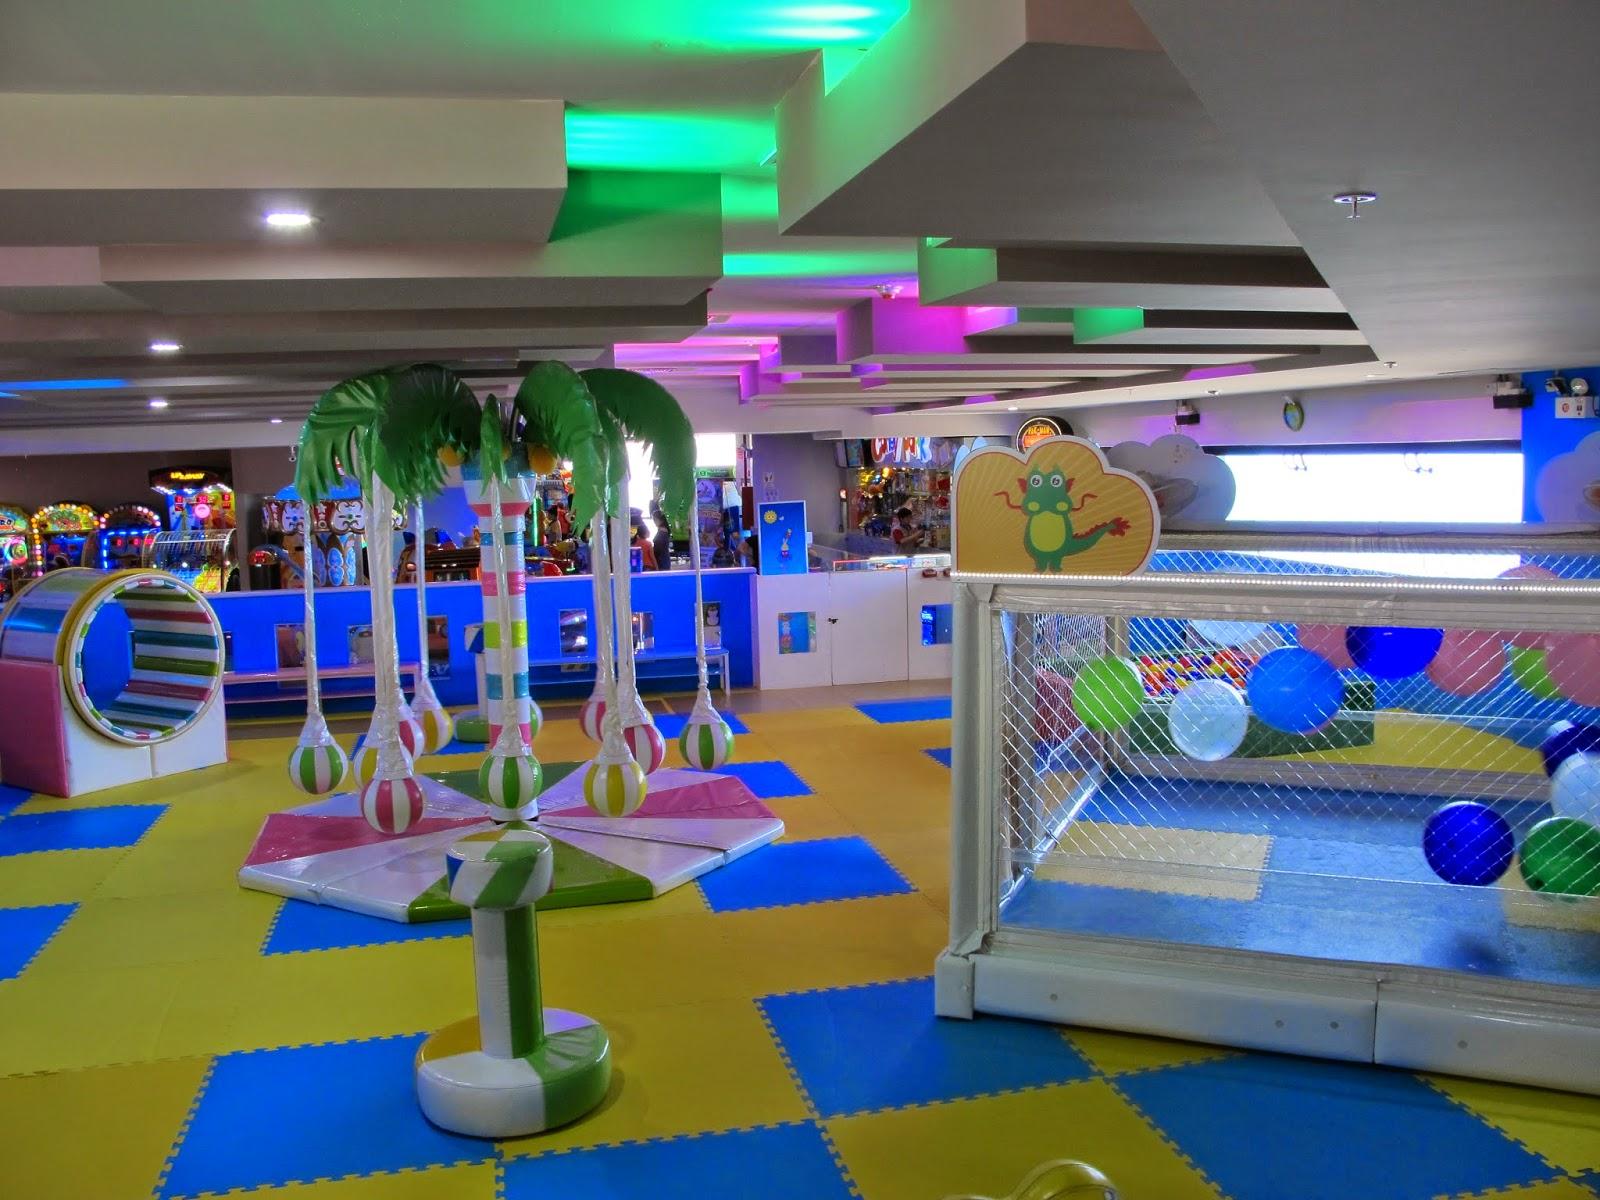 comidas kids friendly em Lima, no Peru. Kids eat in Larcomar mall, Miraflores